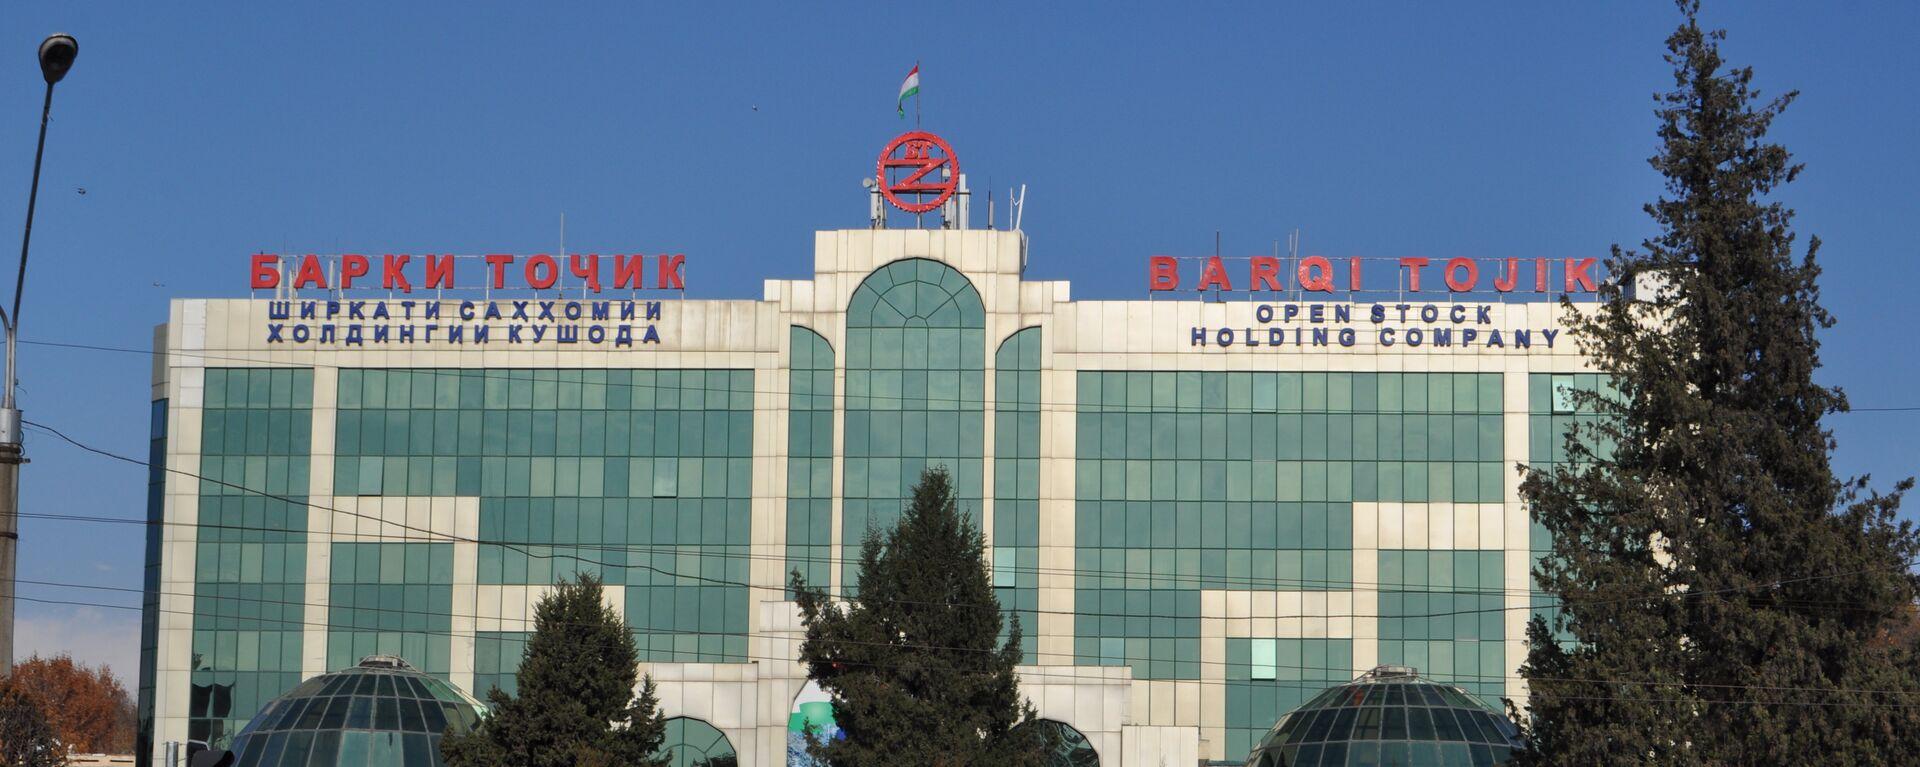 Здание Барки Точик. Архивное фото - Sputnik Таджикистан, 1920, 29.07.2021